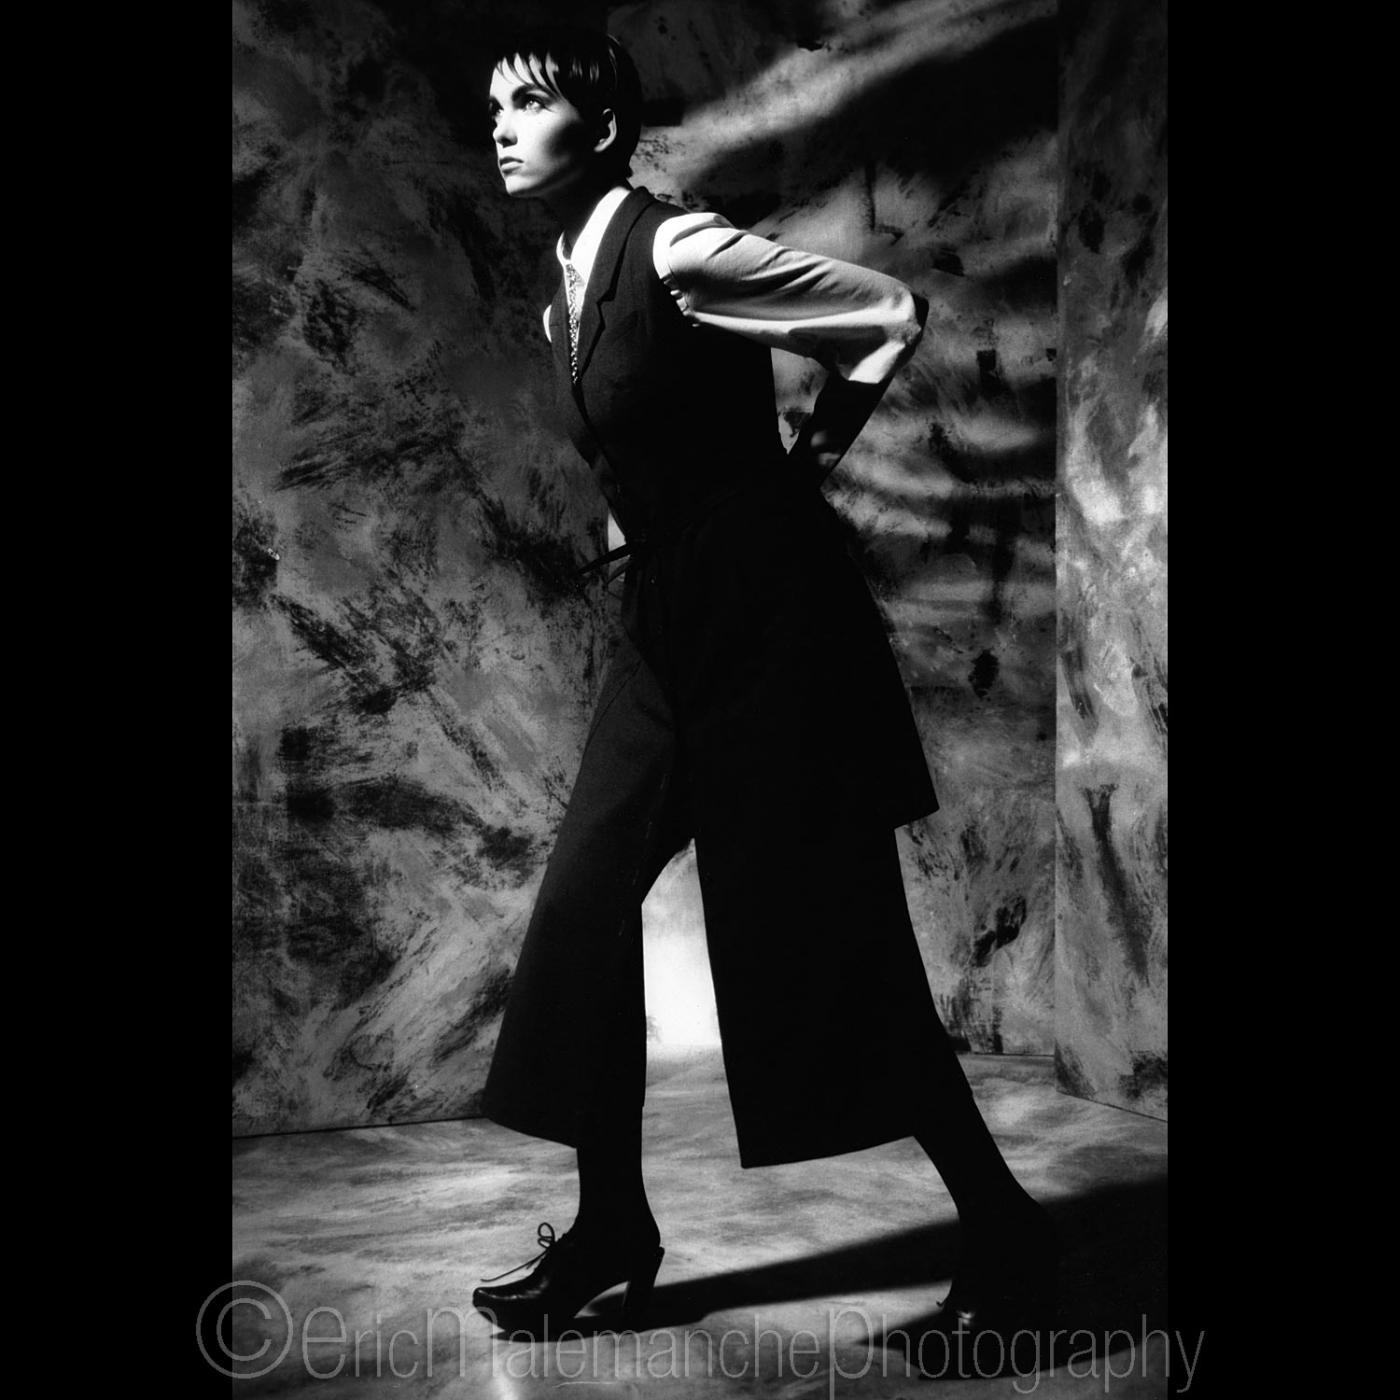 https://www.ericmalemanche.com/imagess/topics/fashion-90-s/liste/Fashion-Carbur-01.jpg